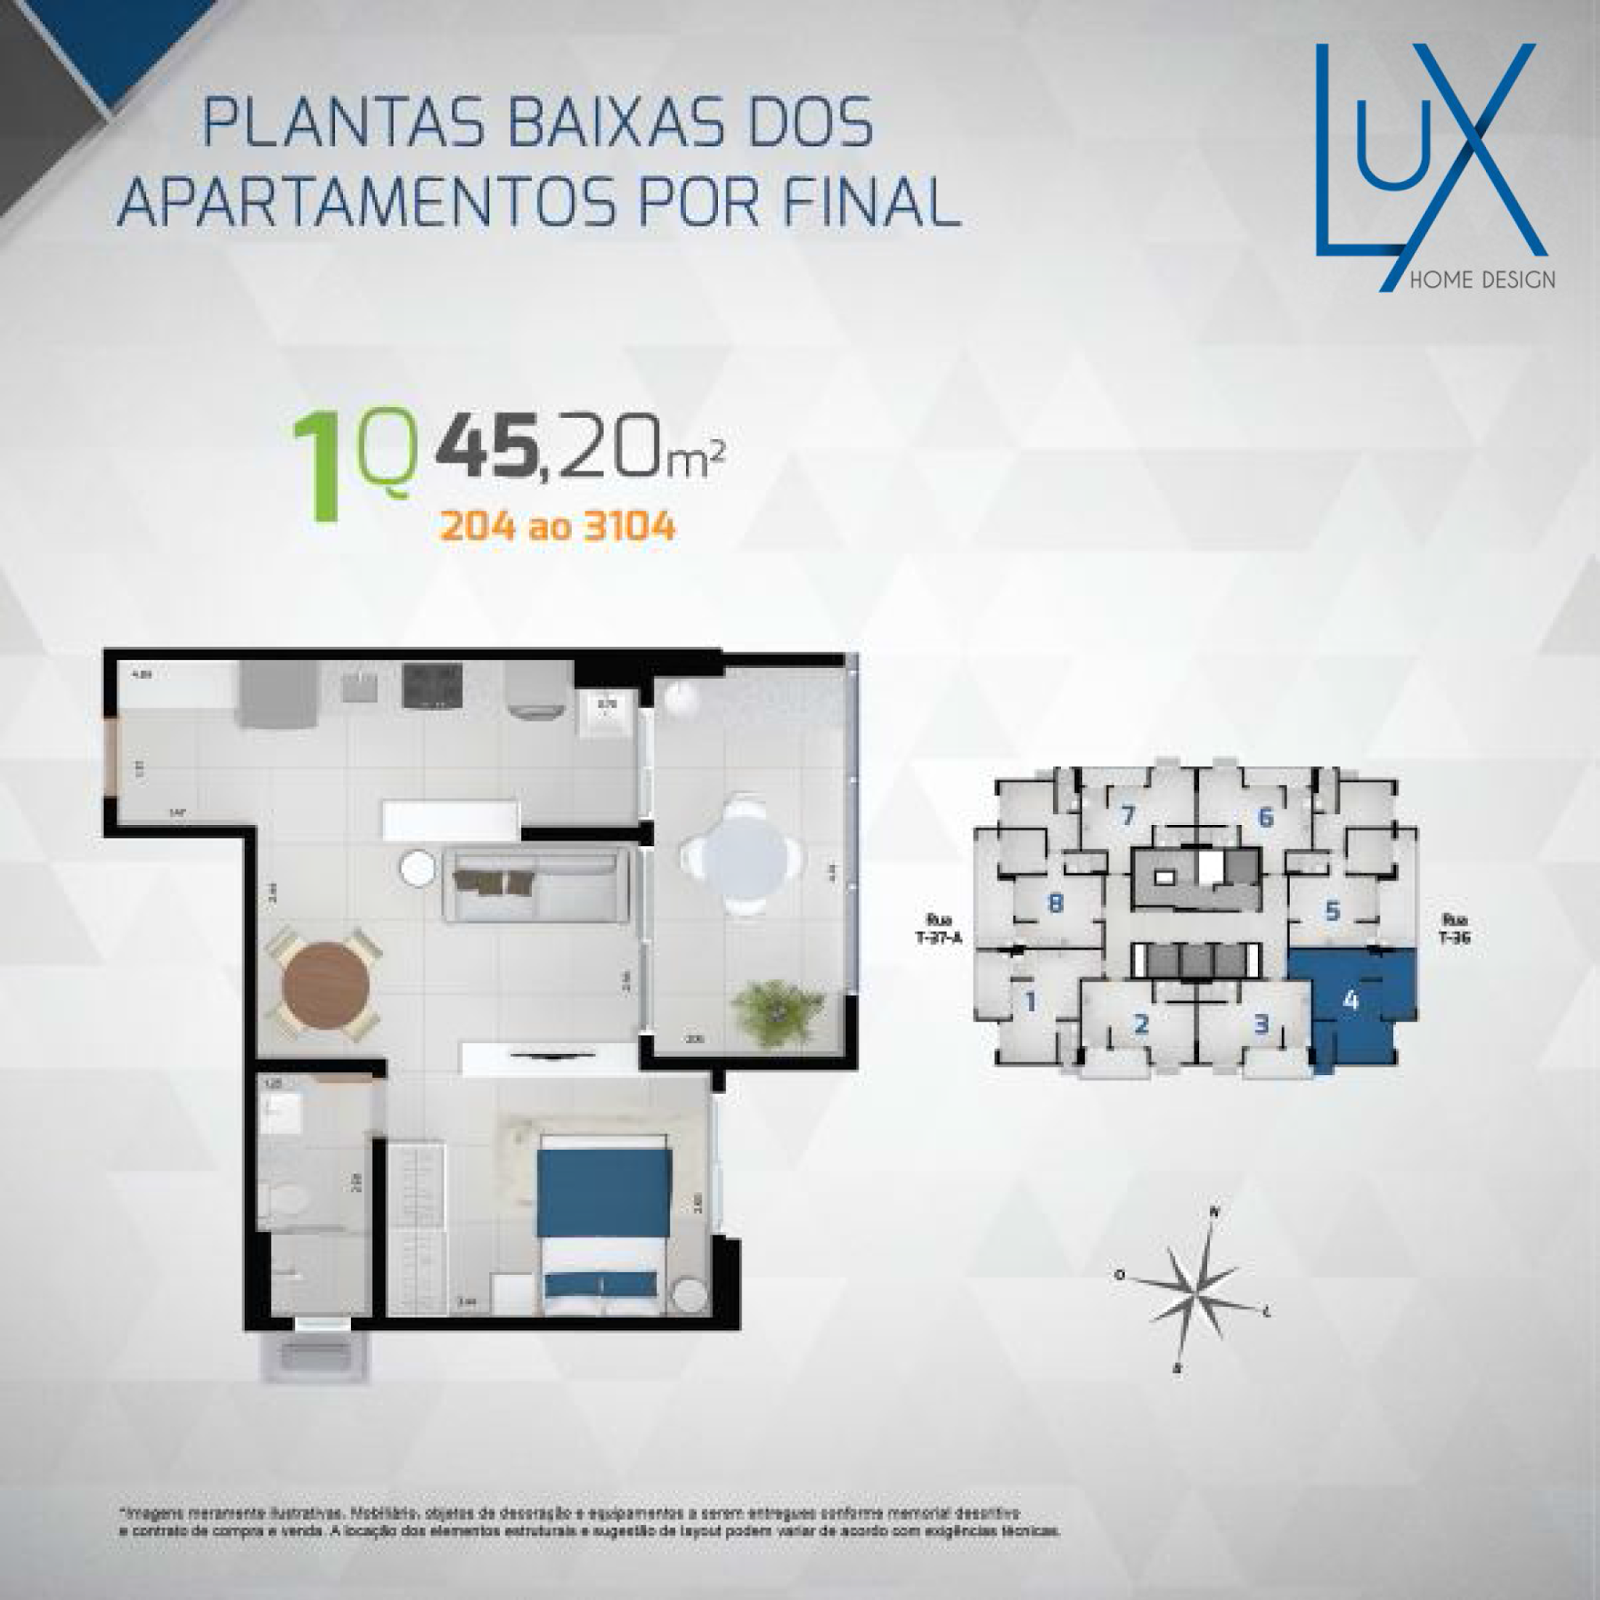 Disponibilidade Lux Home Design